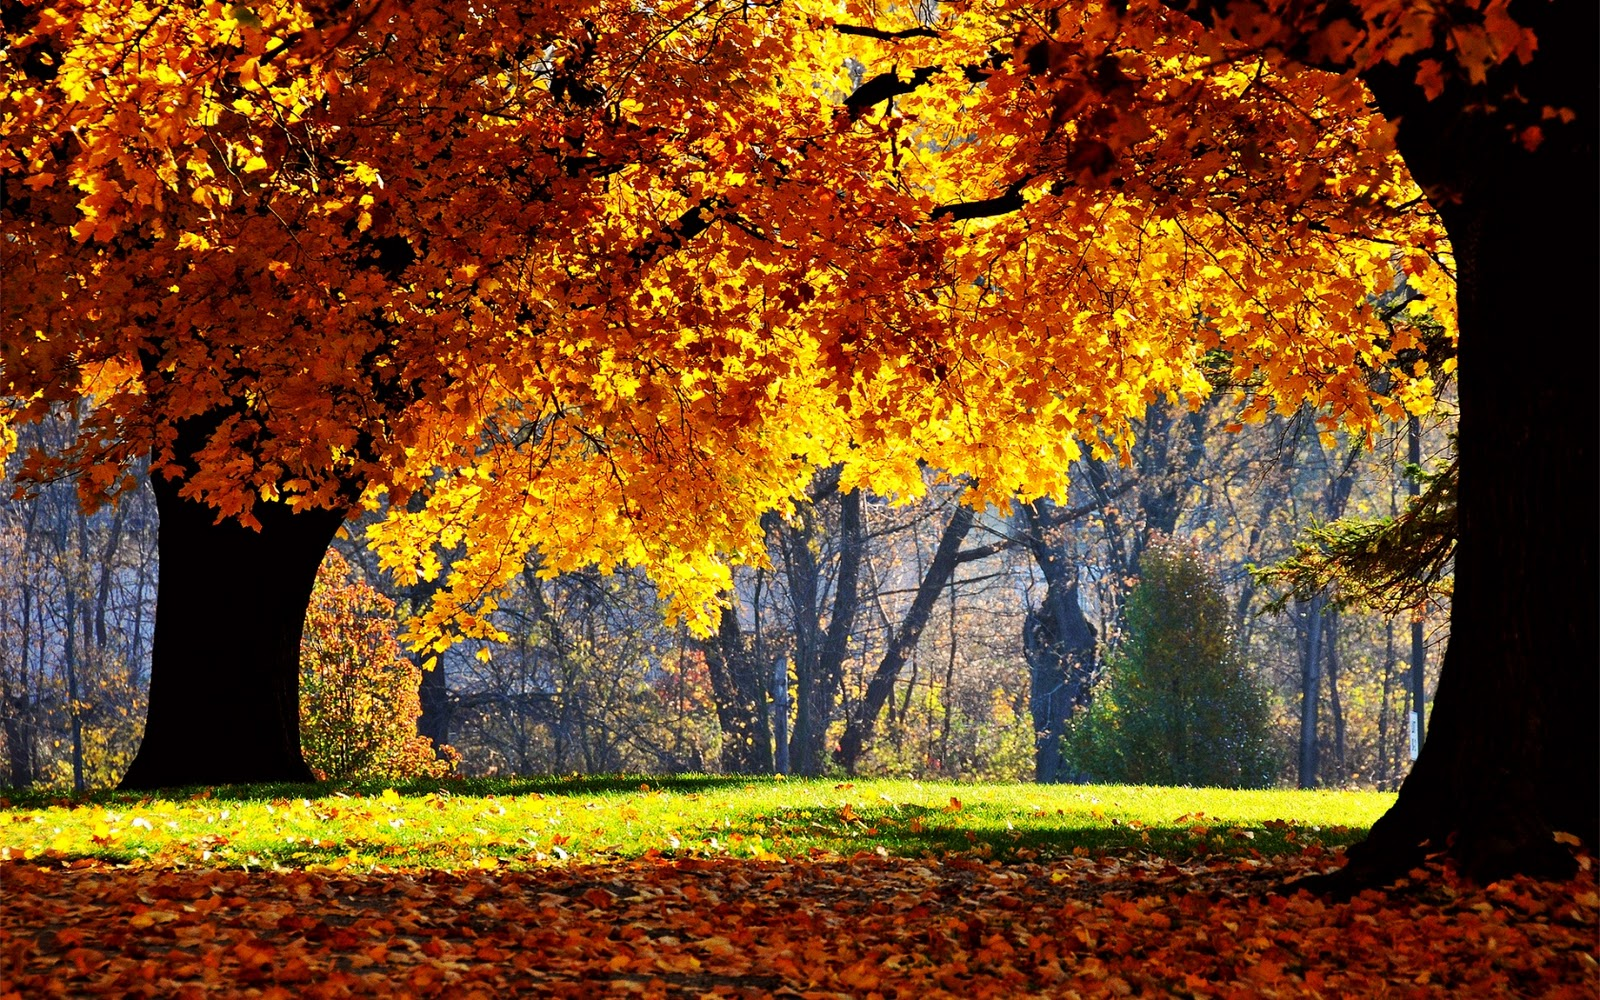 Hd Desktop Wallpapers Autumn Wallpapers